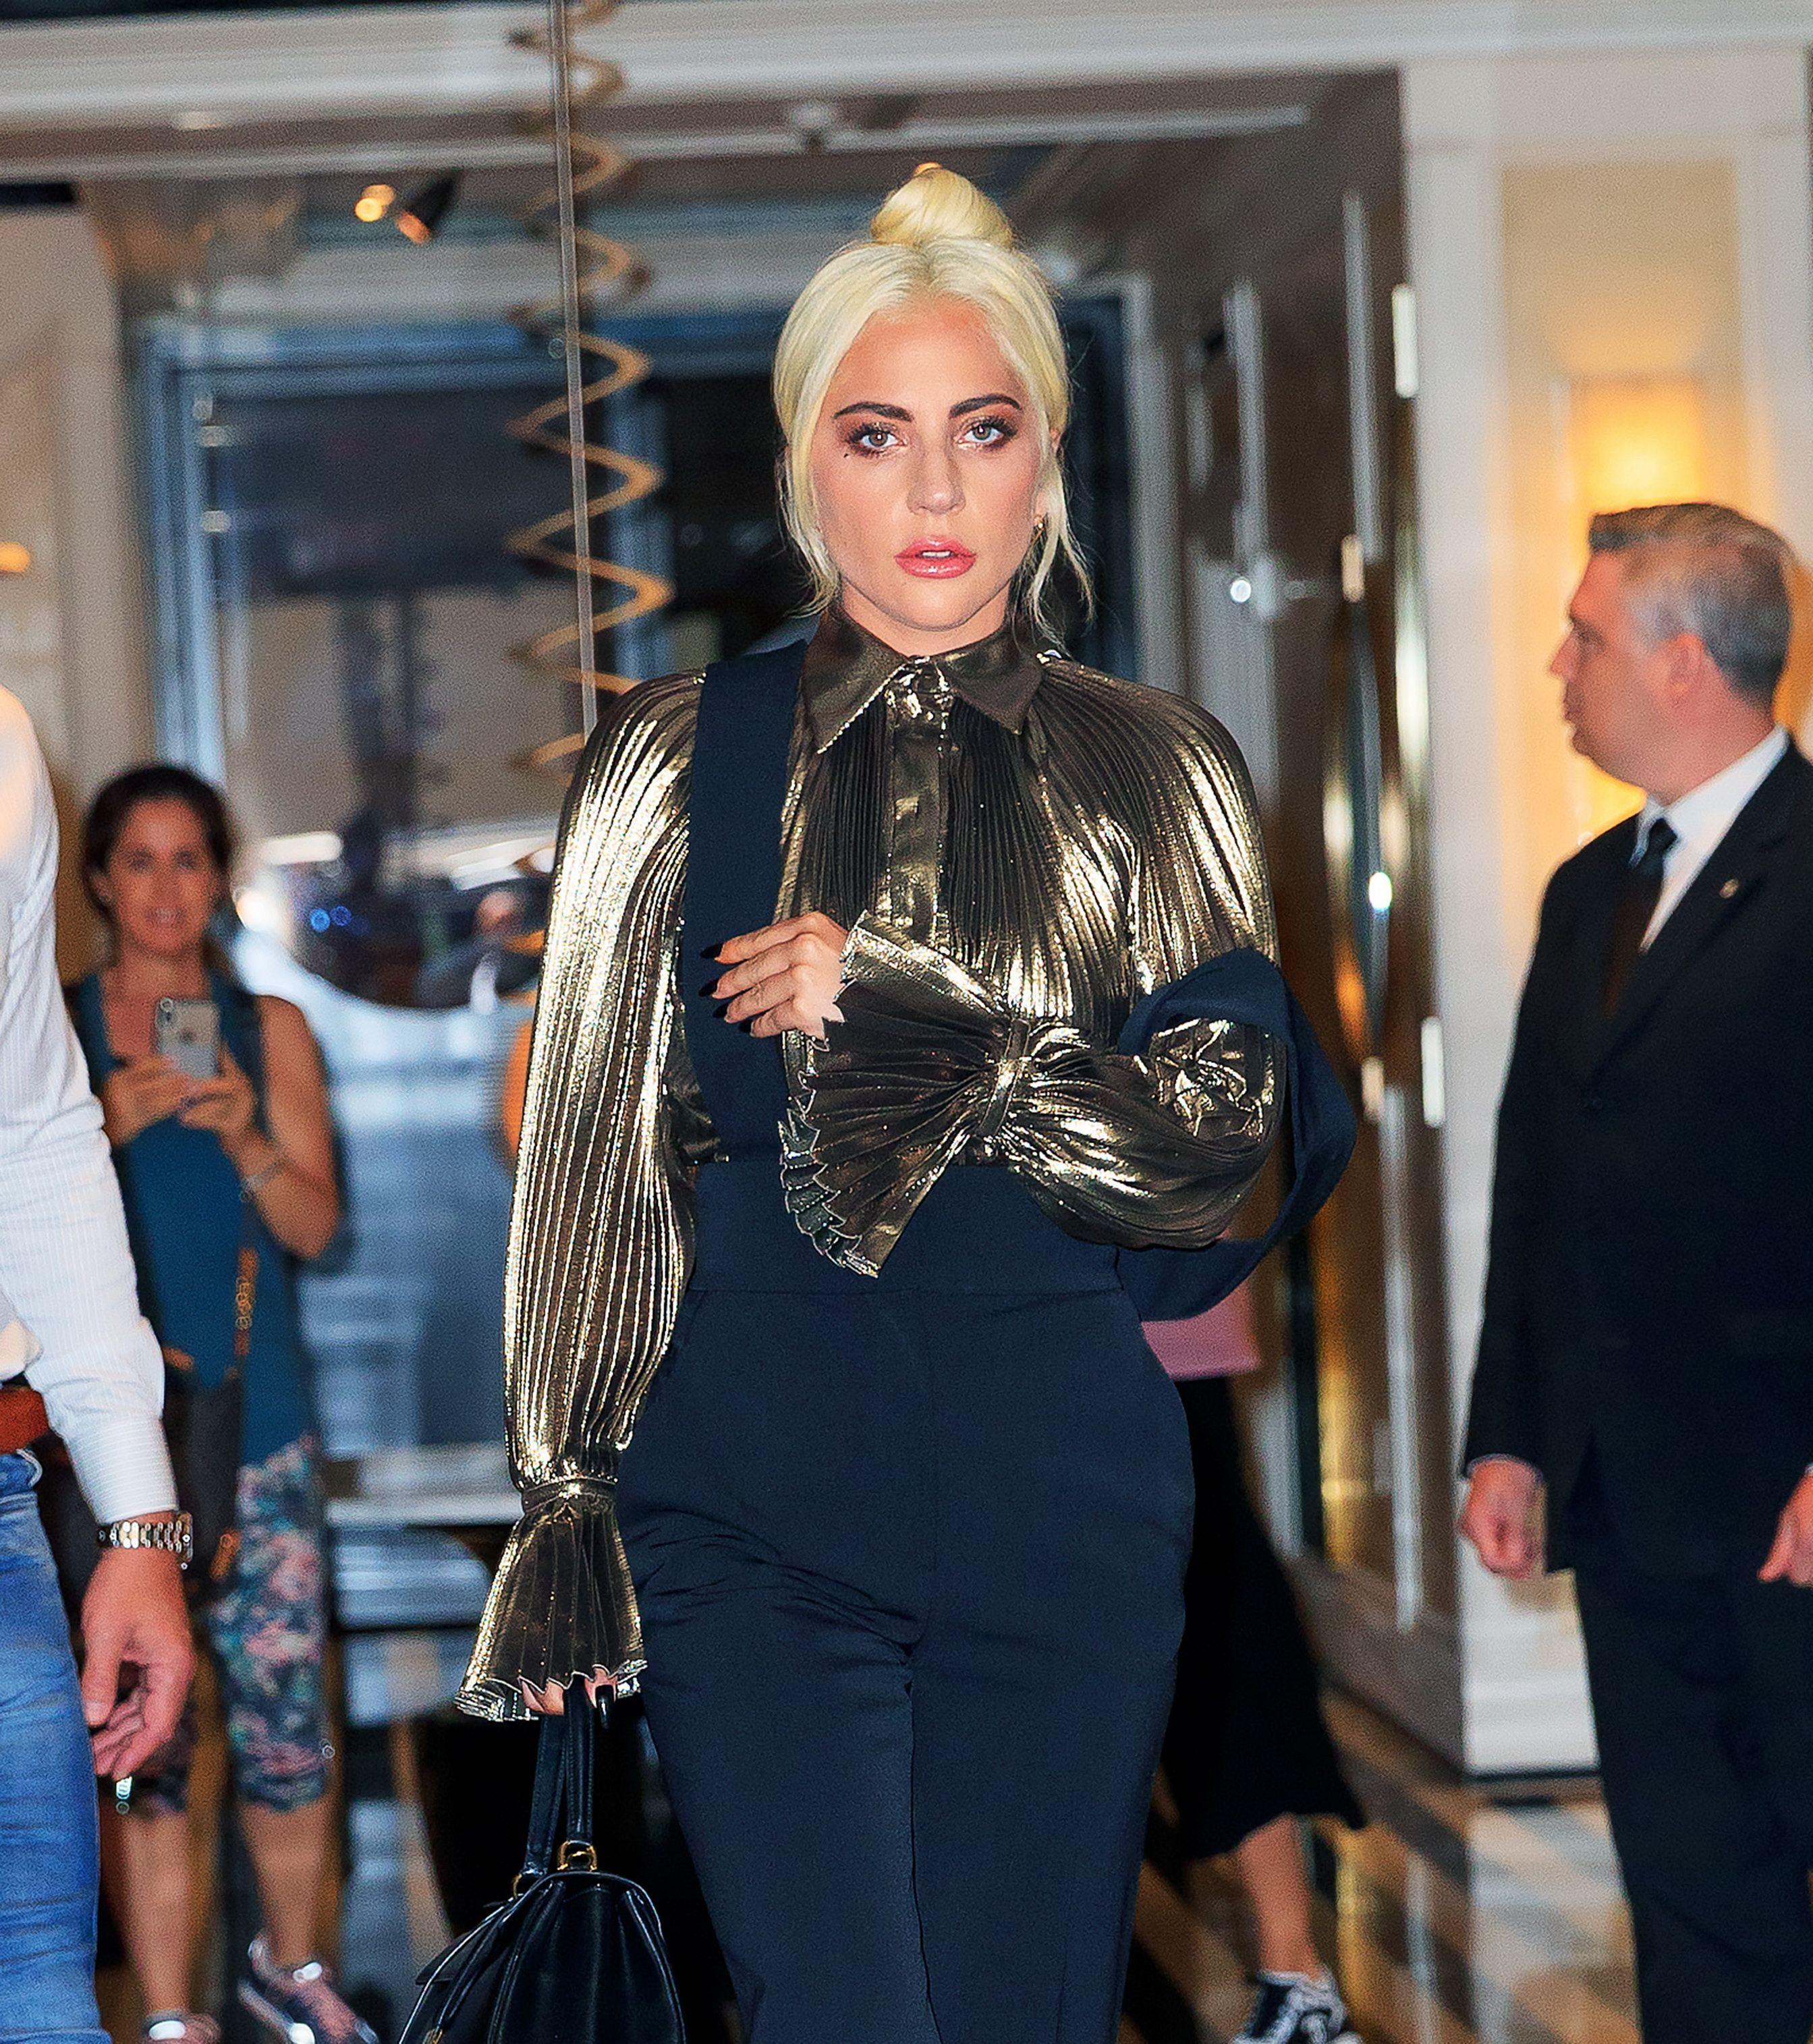 Lady Gaga Celebrates Multi-Platinum Status With New Pink Hair